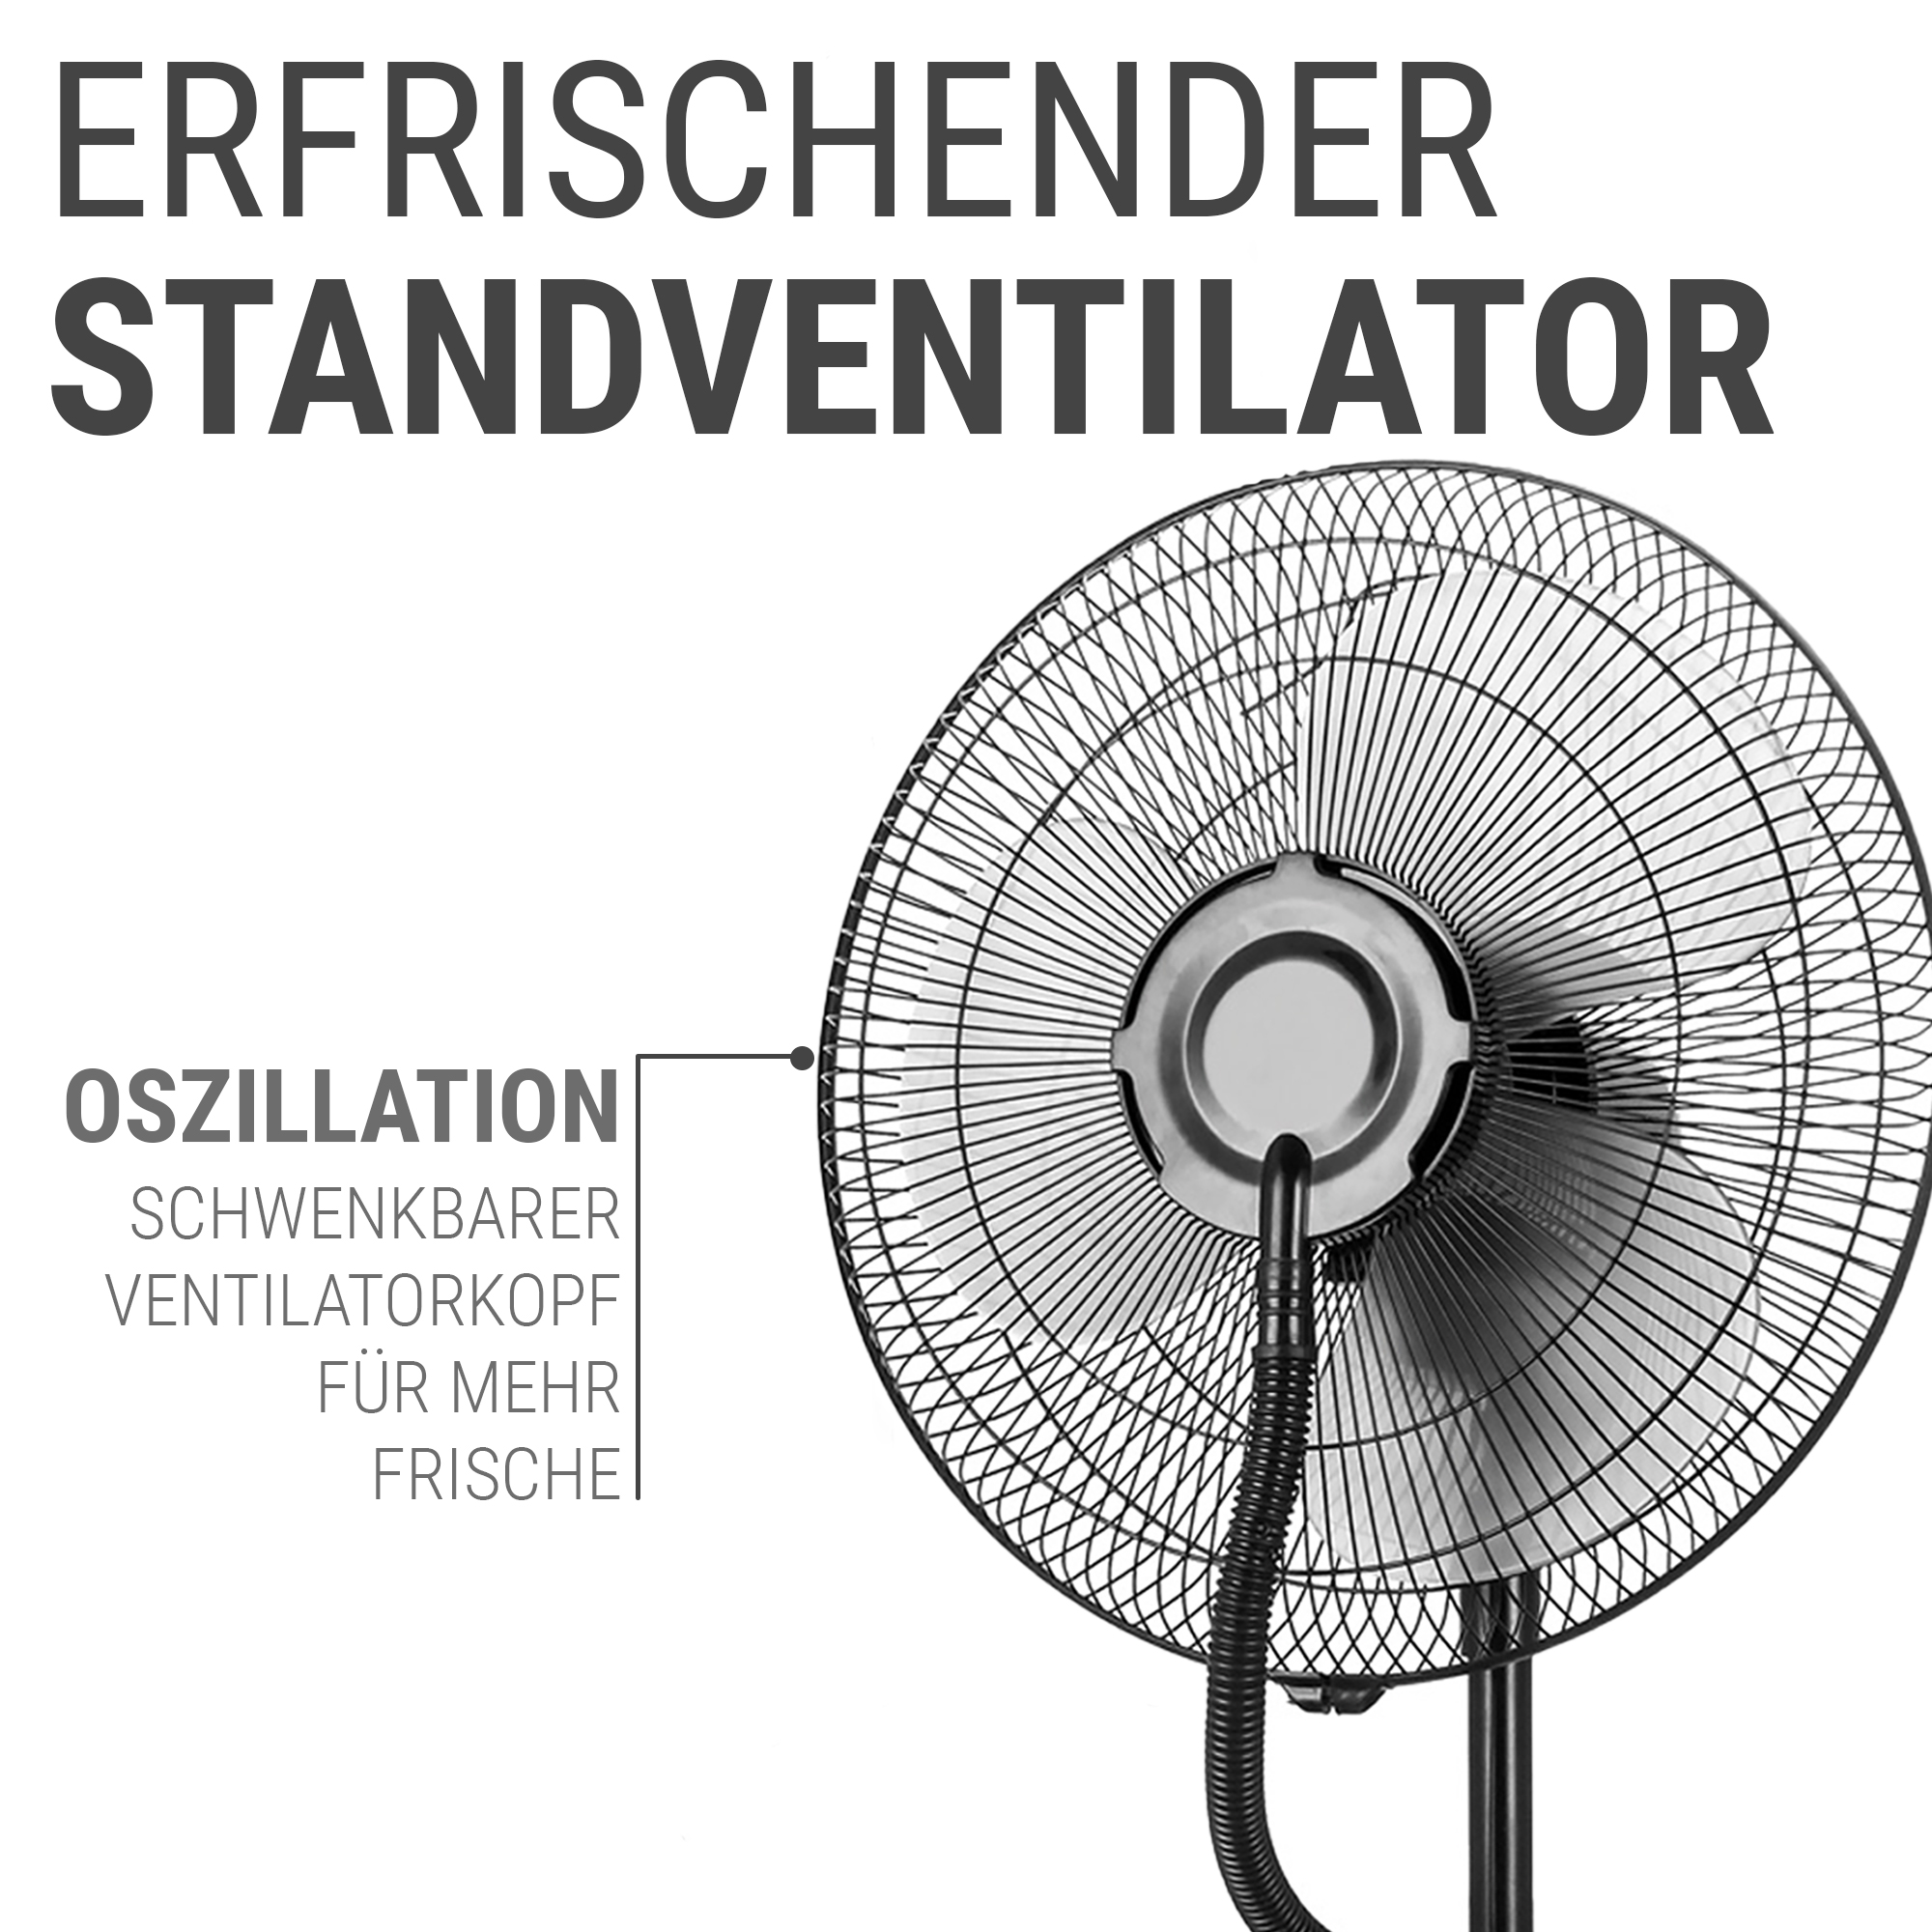 Standventilator leise, neigbar mit optionaler Oszillation